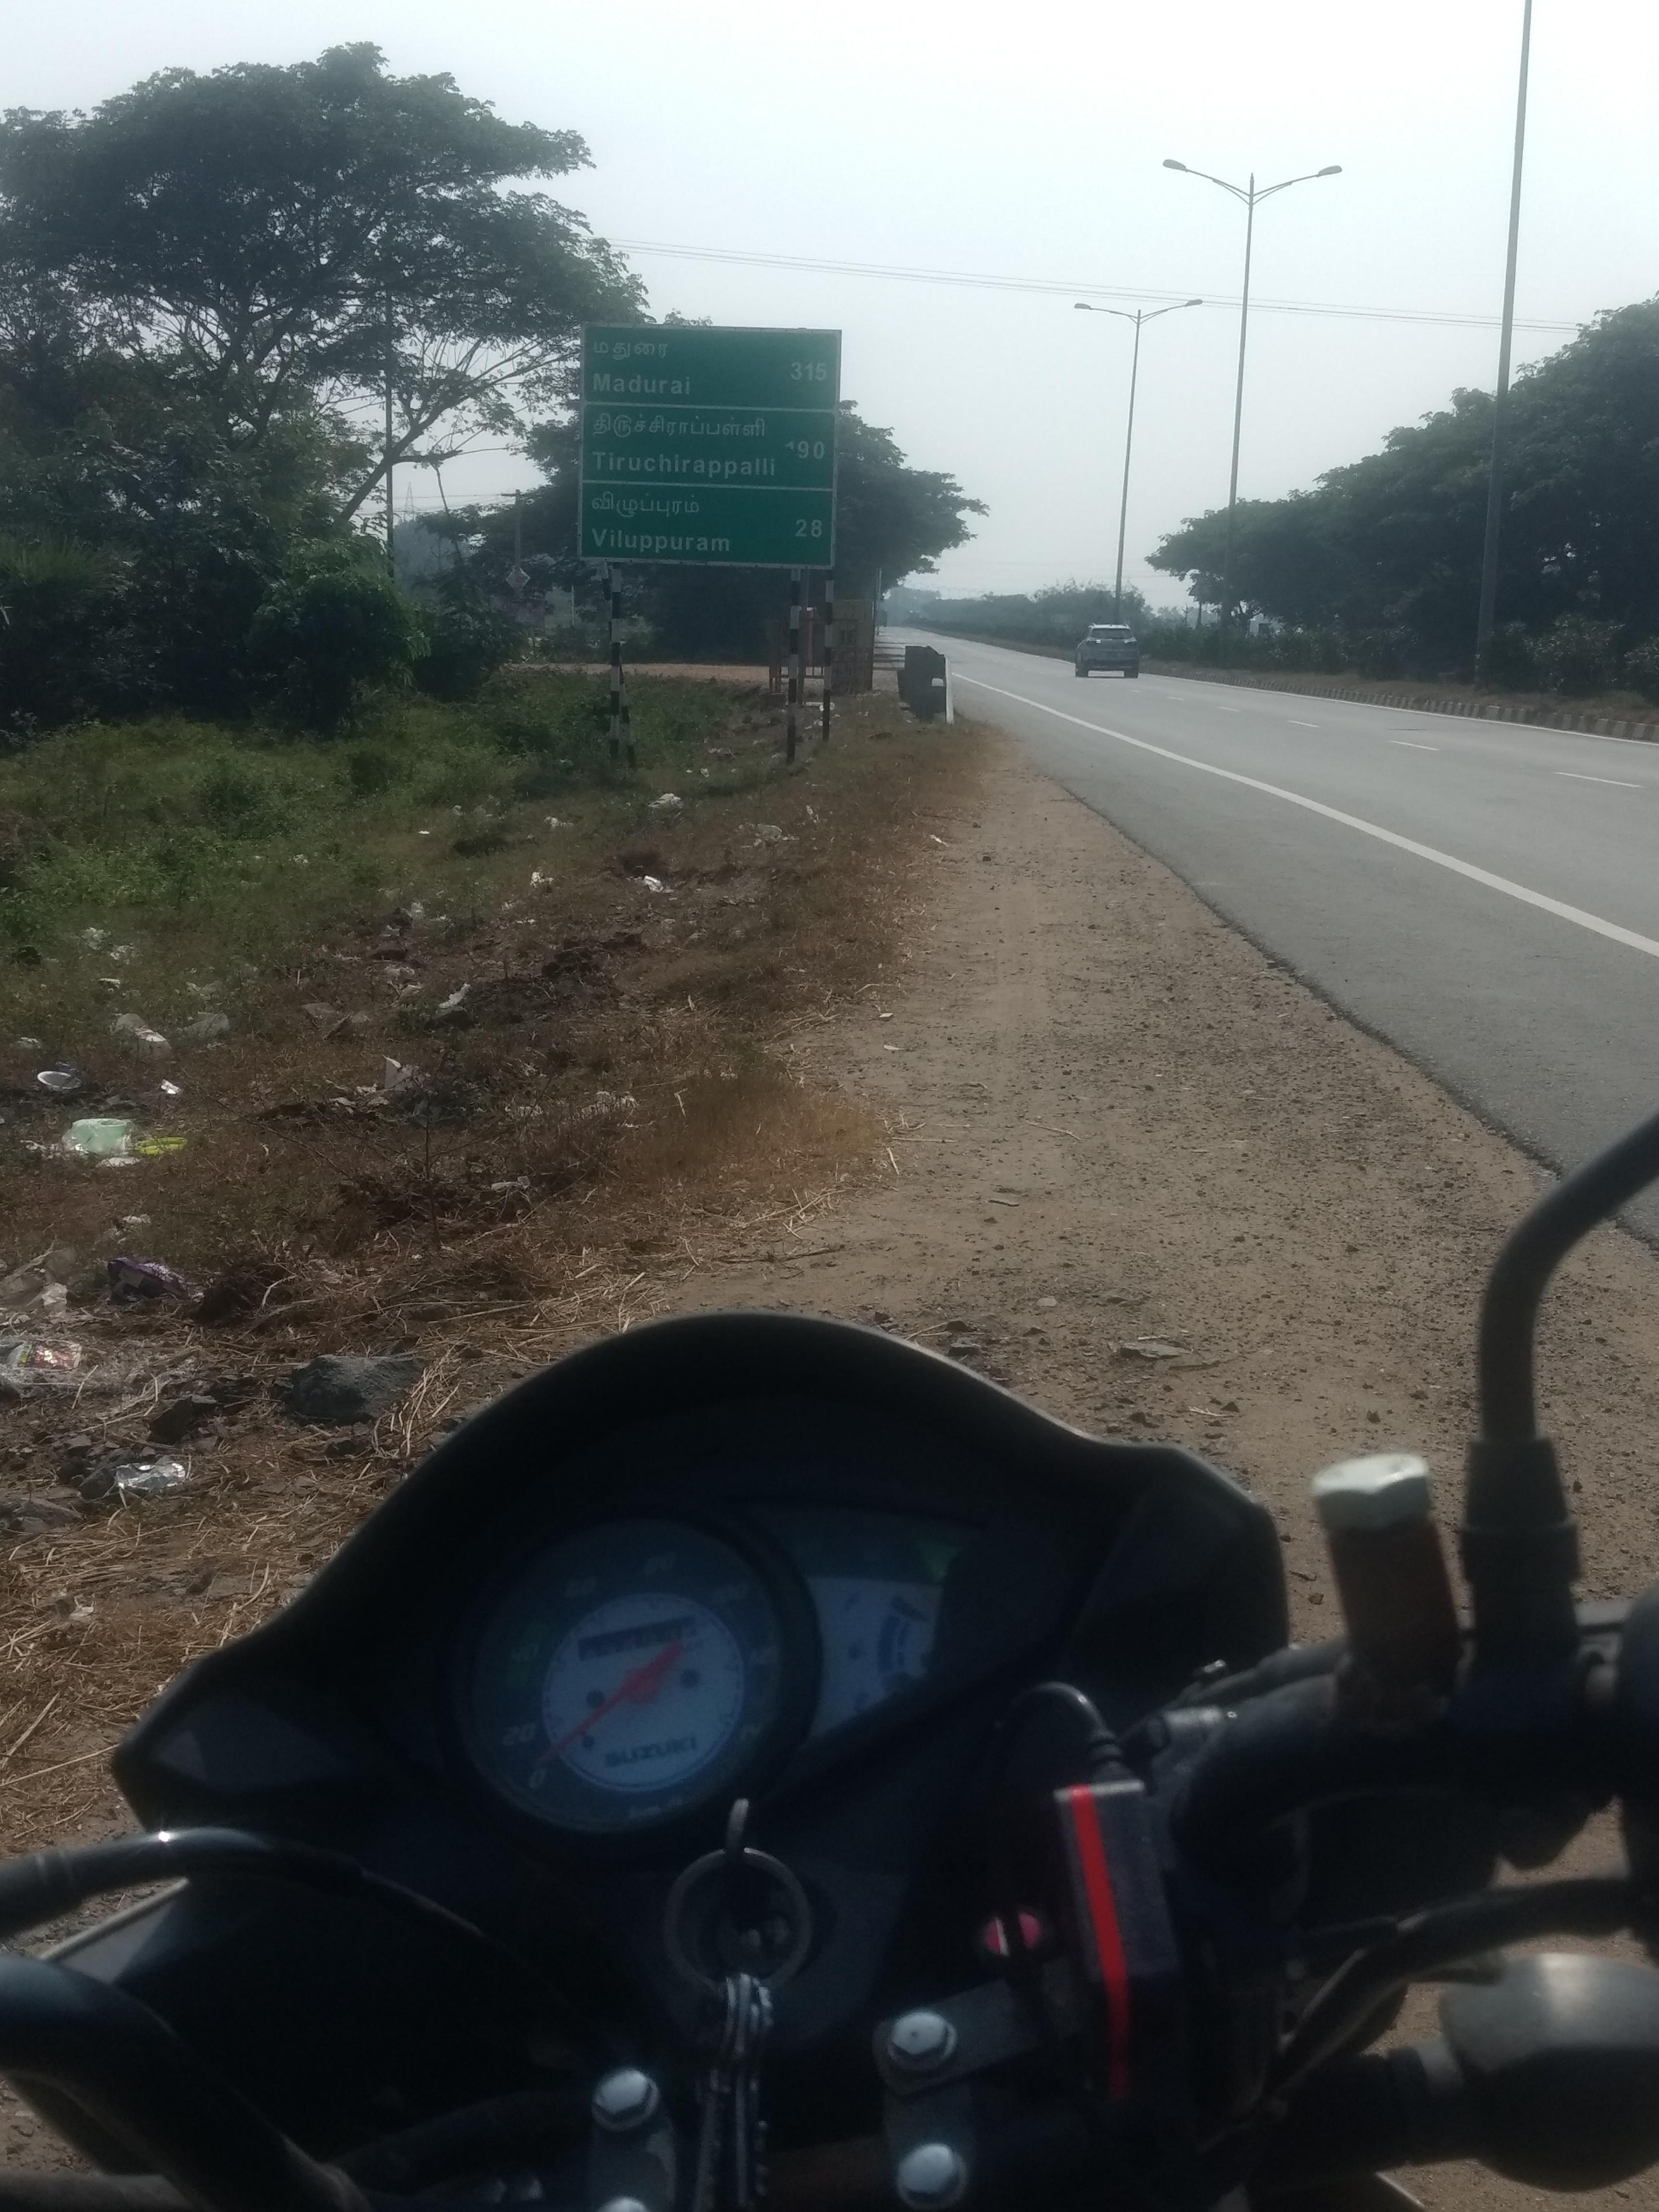 Ride image by Jaihar Premkumar